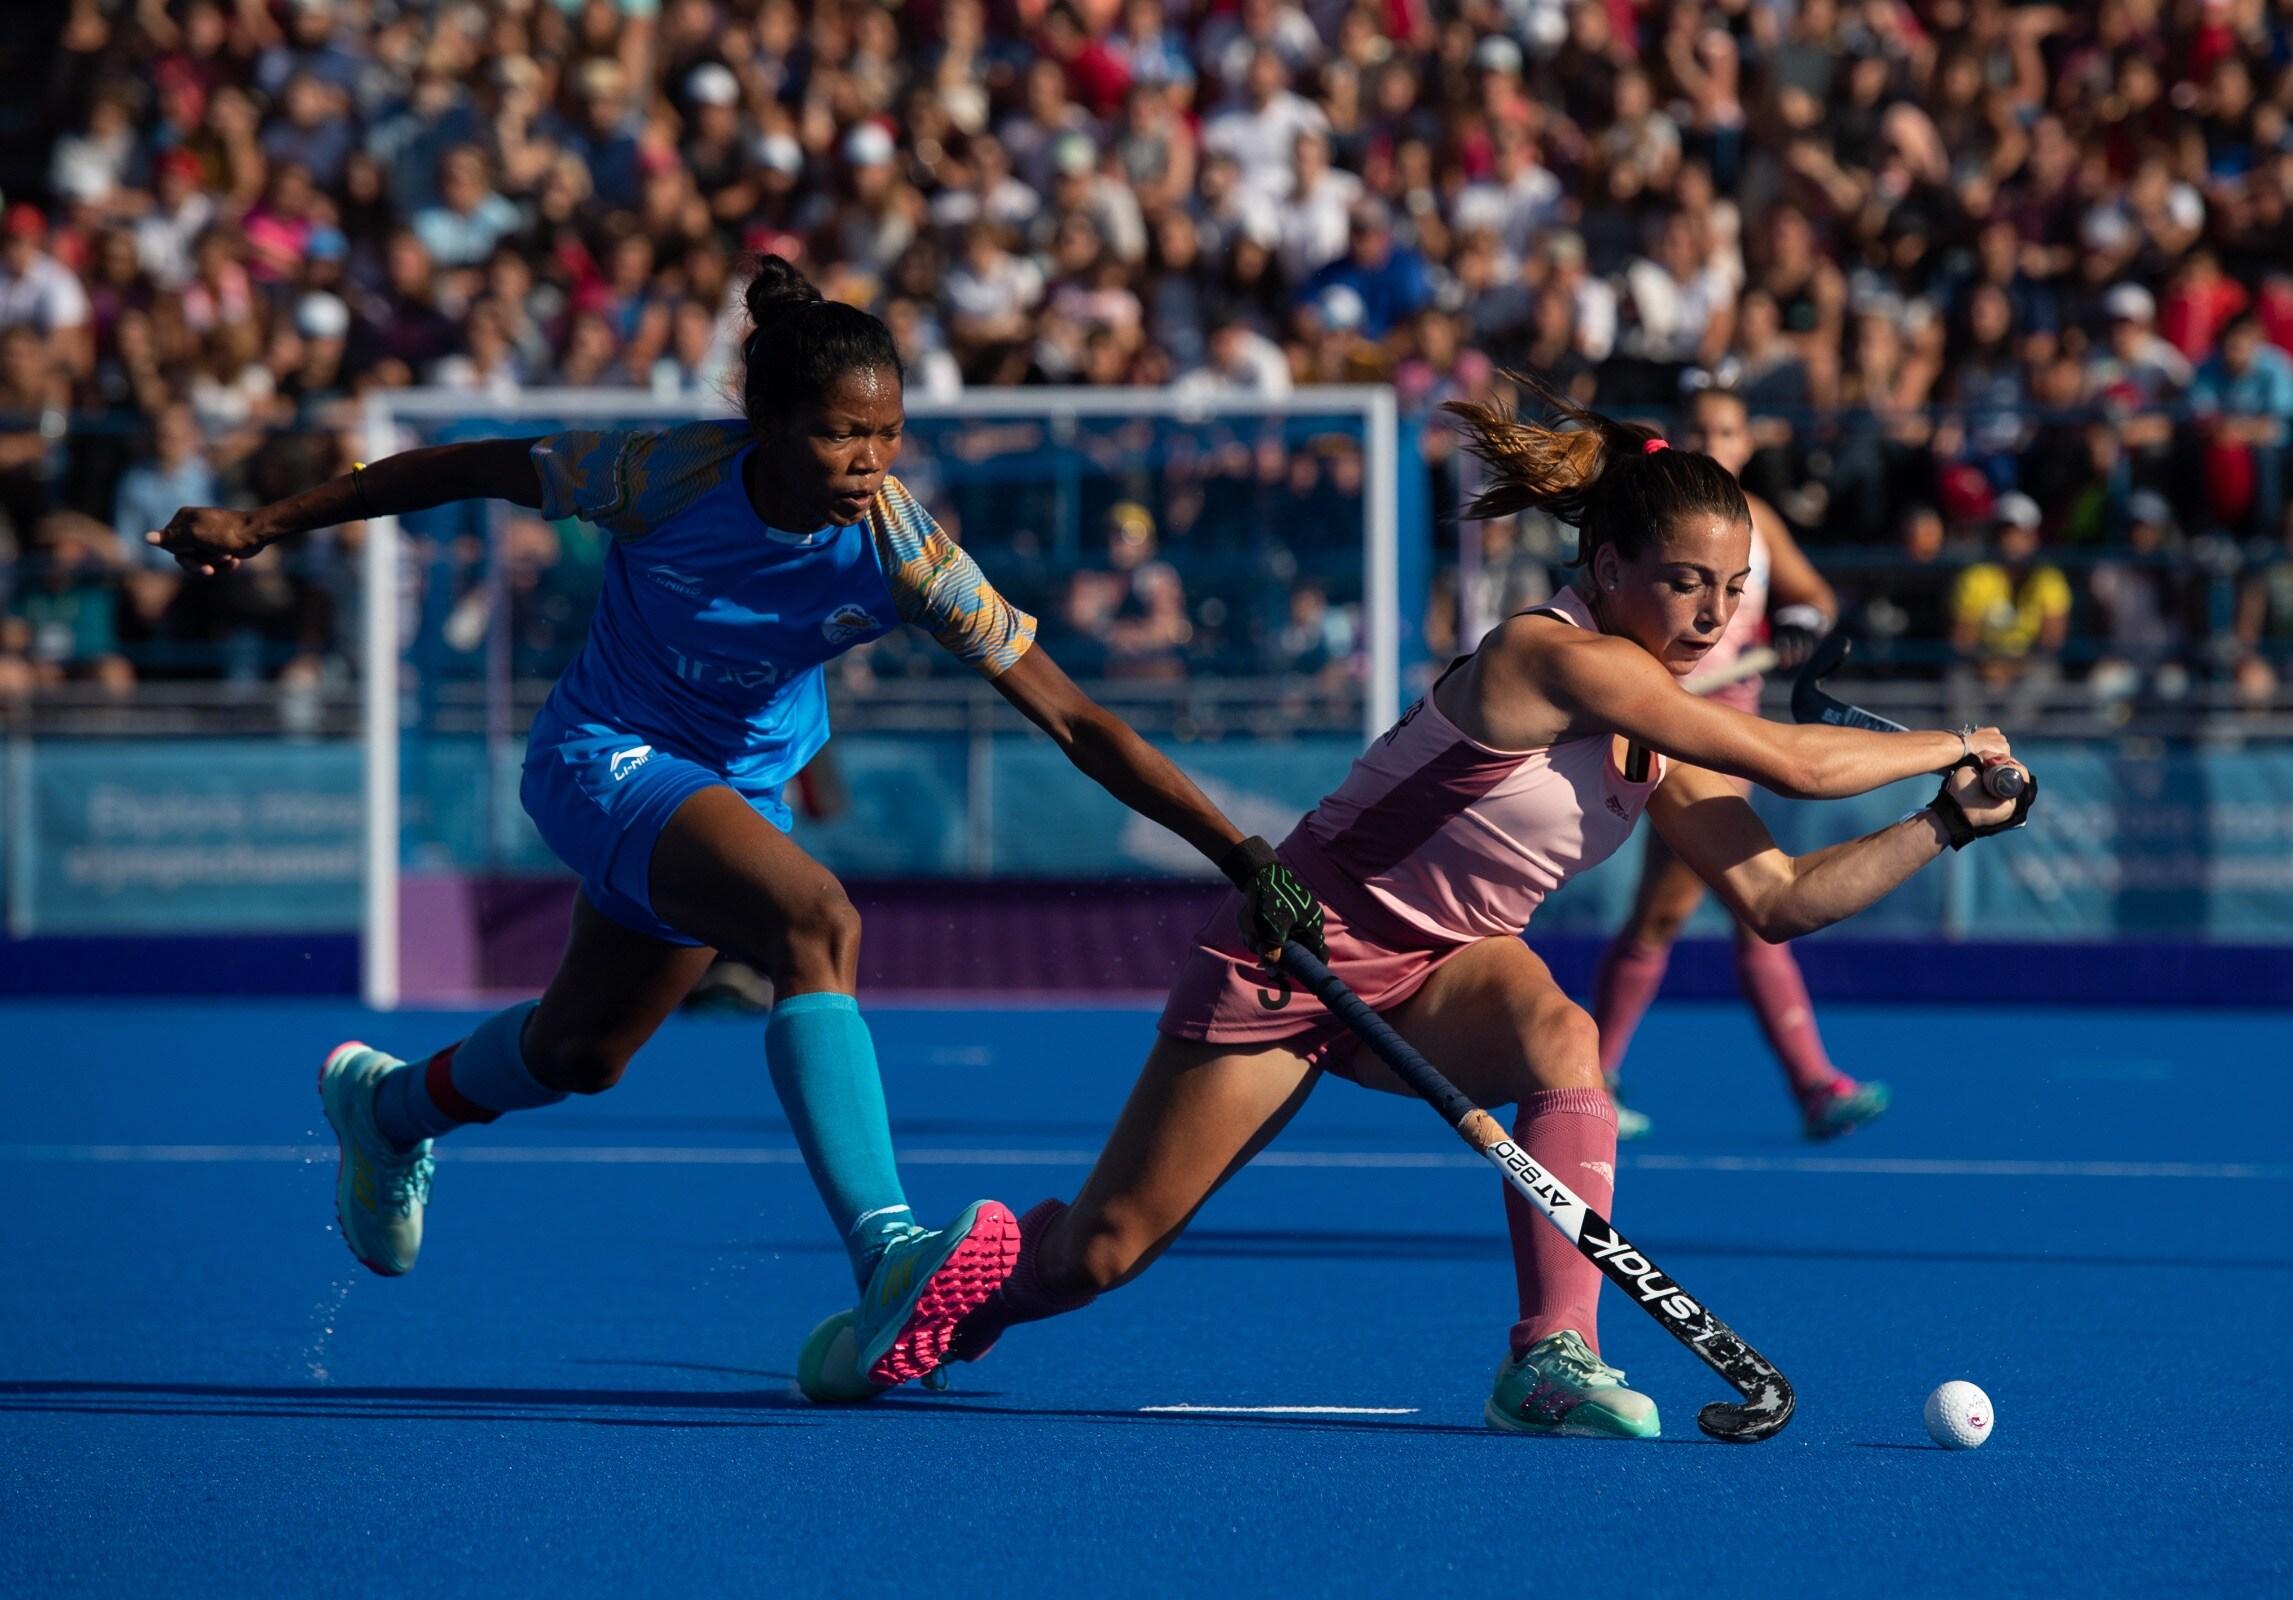 Buenos Aires 2018 - Hockey5s - Women's Tournament